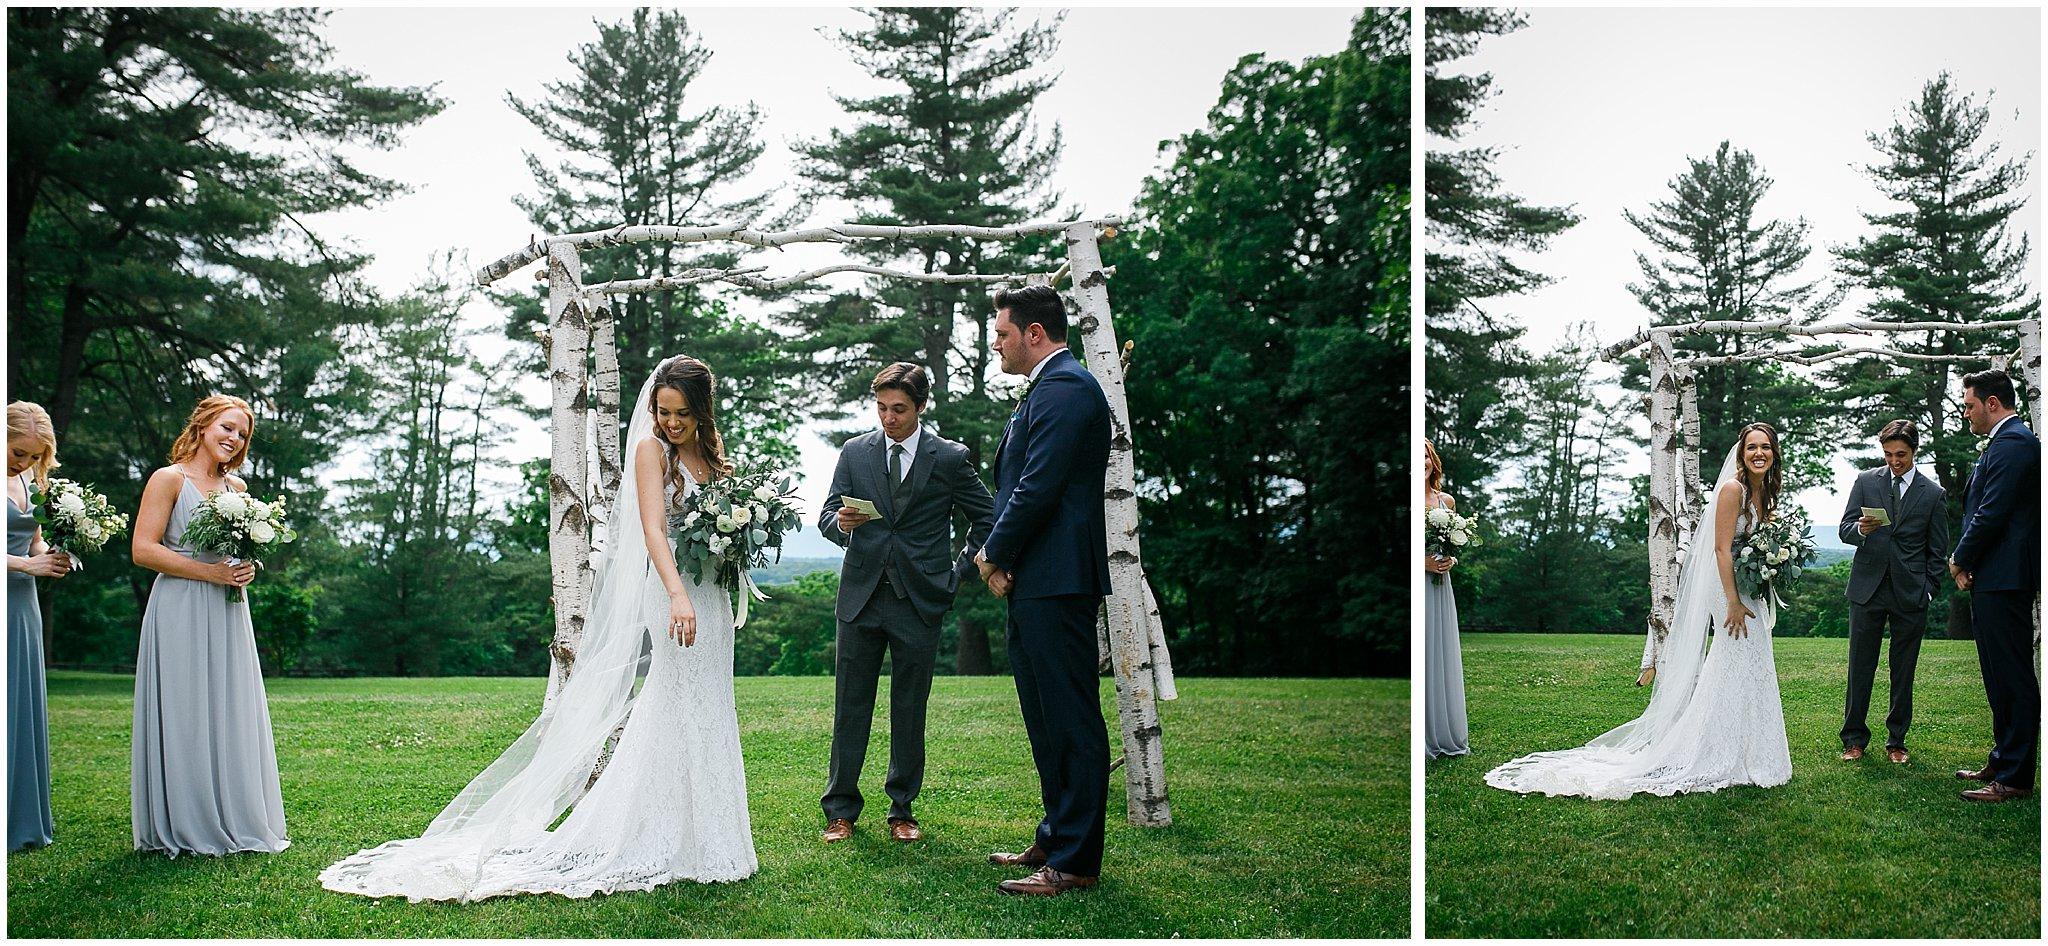 Hudson Valley Weddings at the Hill Hudson New York Wedding Photographer52.jpg